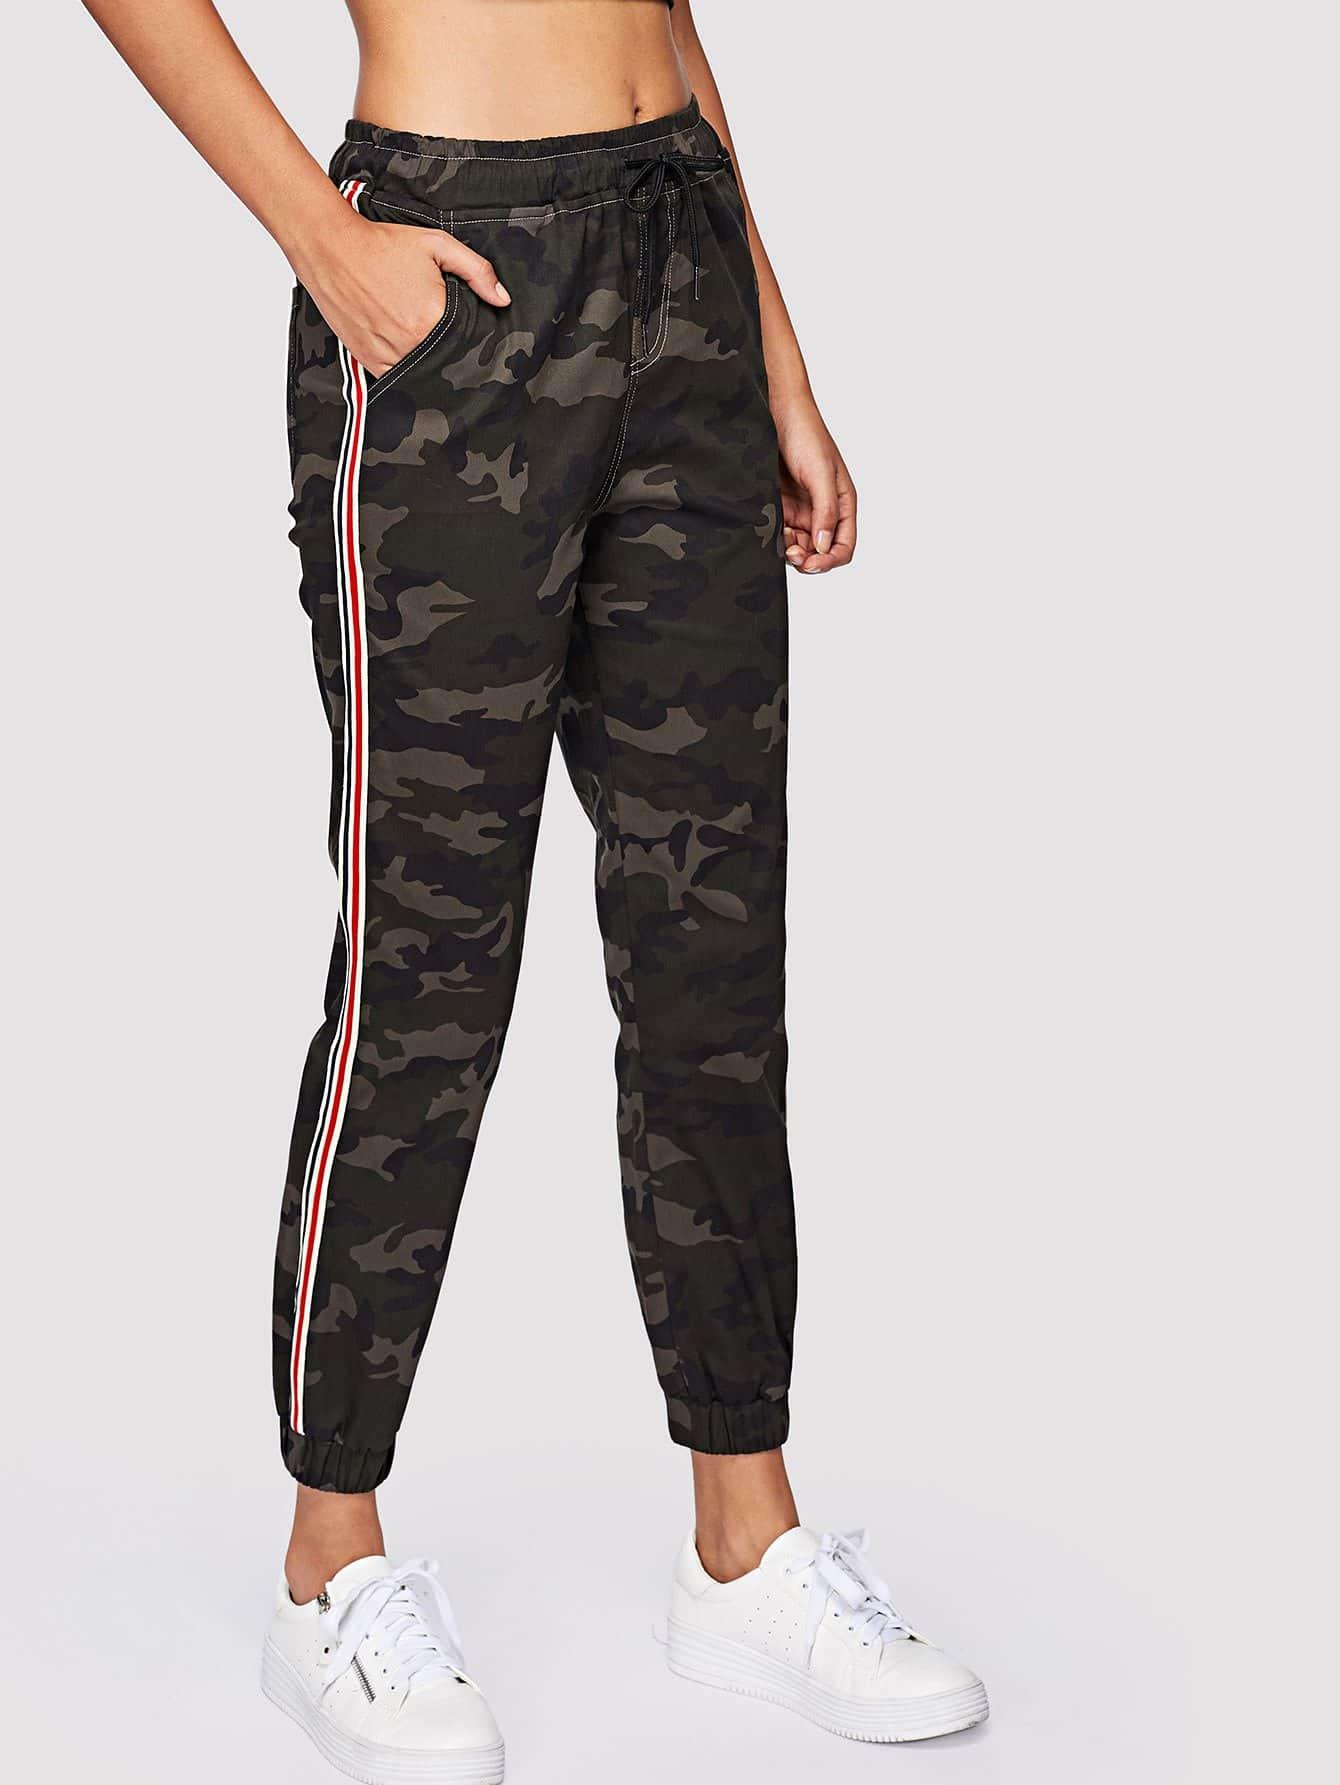 Striped Tape Side Camo Sweatpants striped tape side cuffed pants